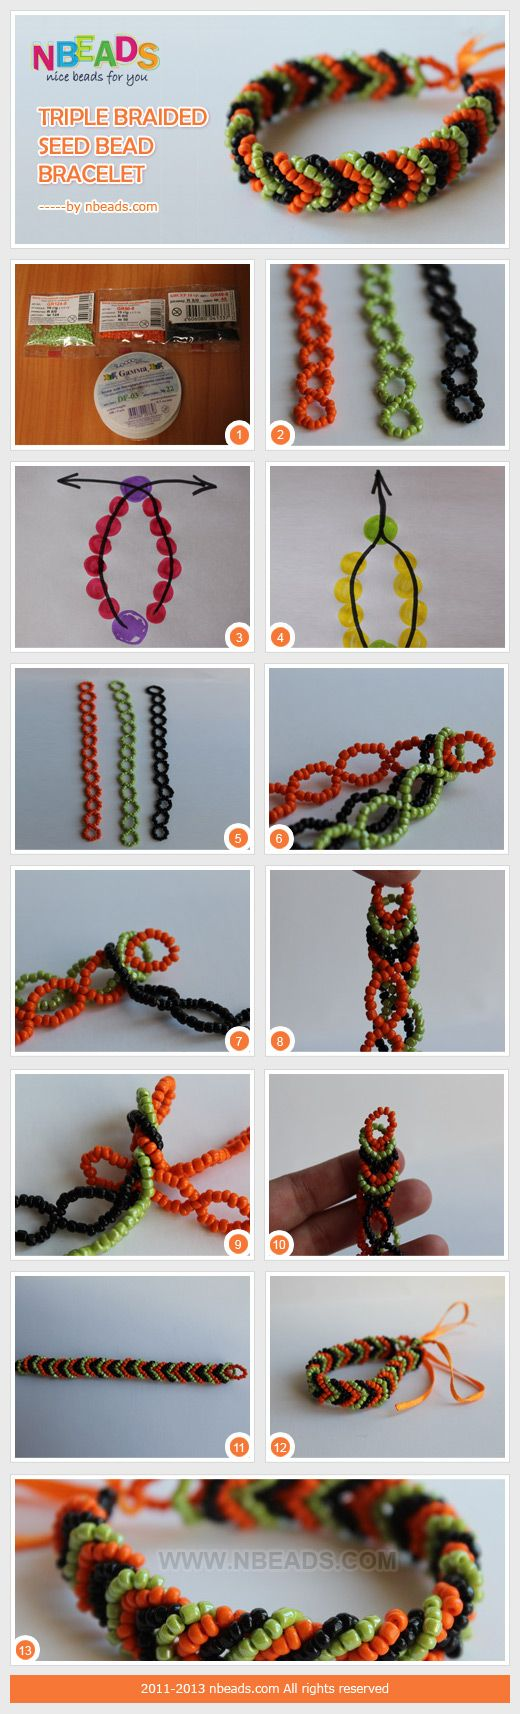 Triple braided seed bead bracelet